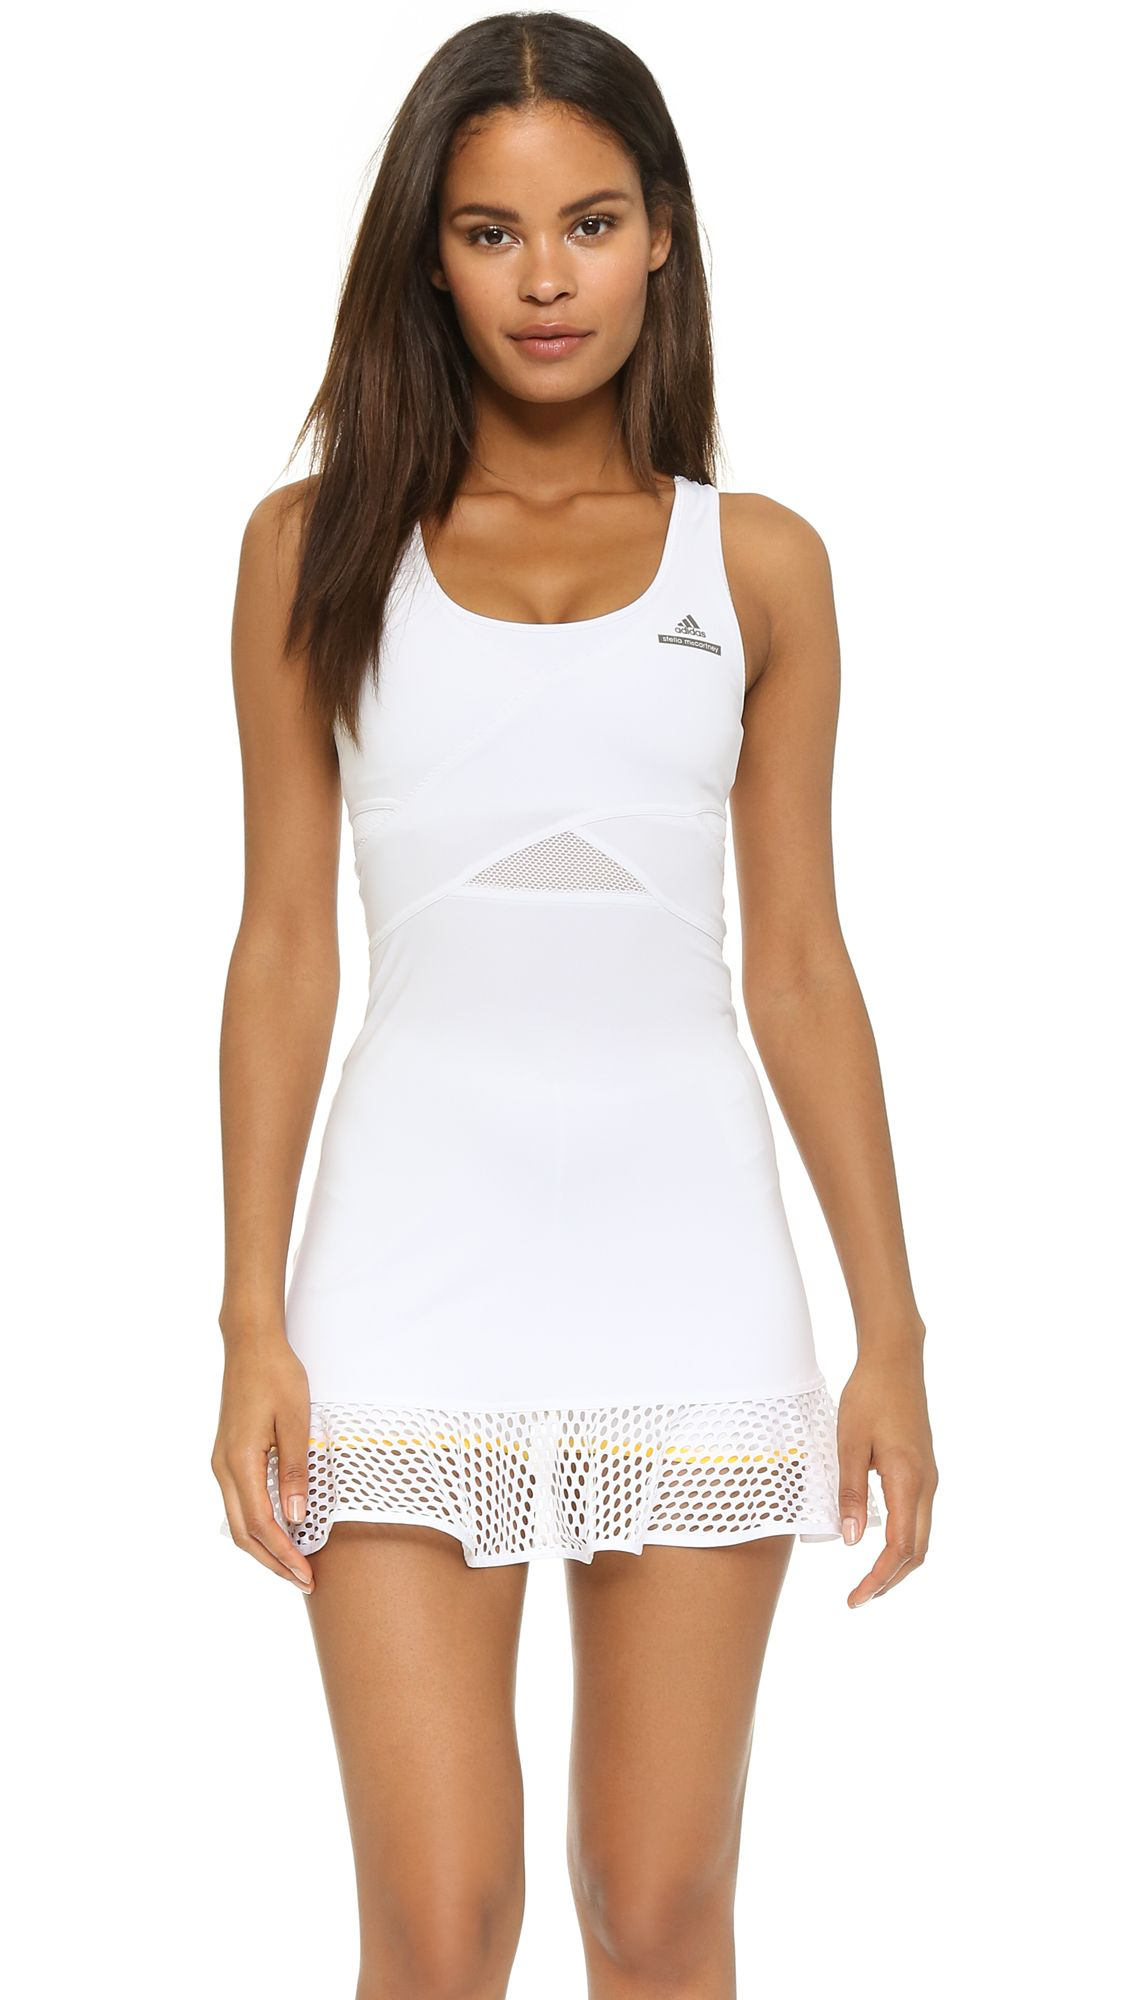 neumático empujar Talla  Item – name   Tennis outfit women, Tennis dress, Tennis clothes